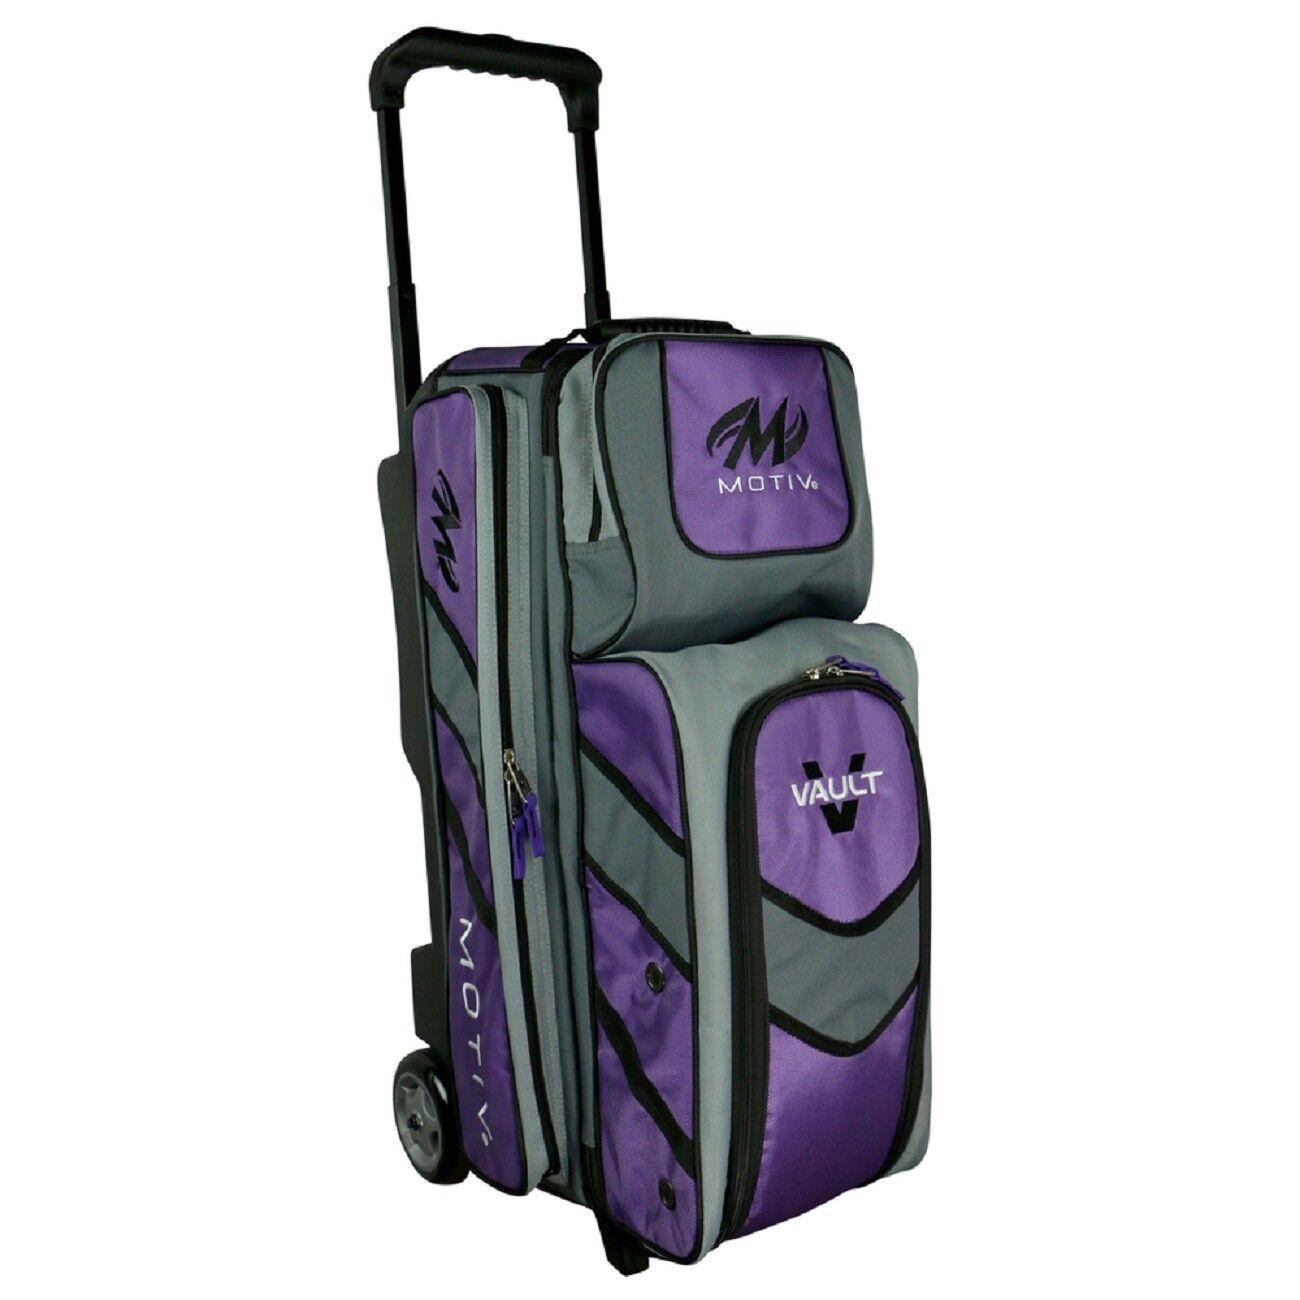 Motiv Vault Deluxe 3 Ball Roller Bowling Bag 5  Urethane Wheels Purple NEWEST